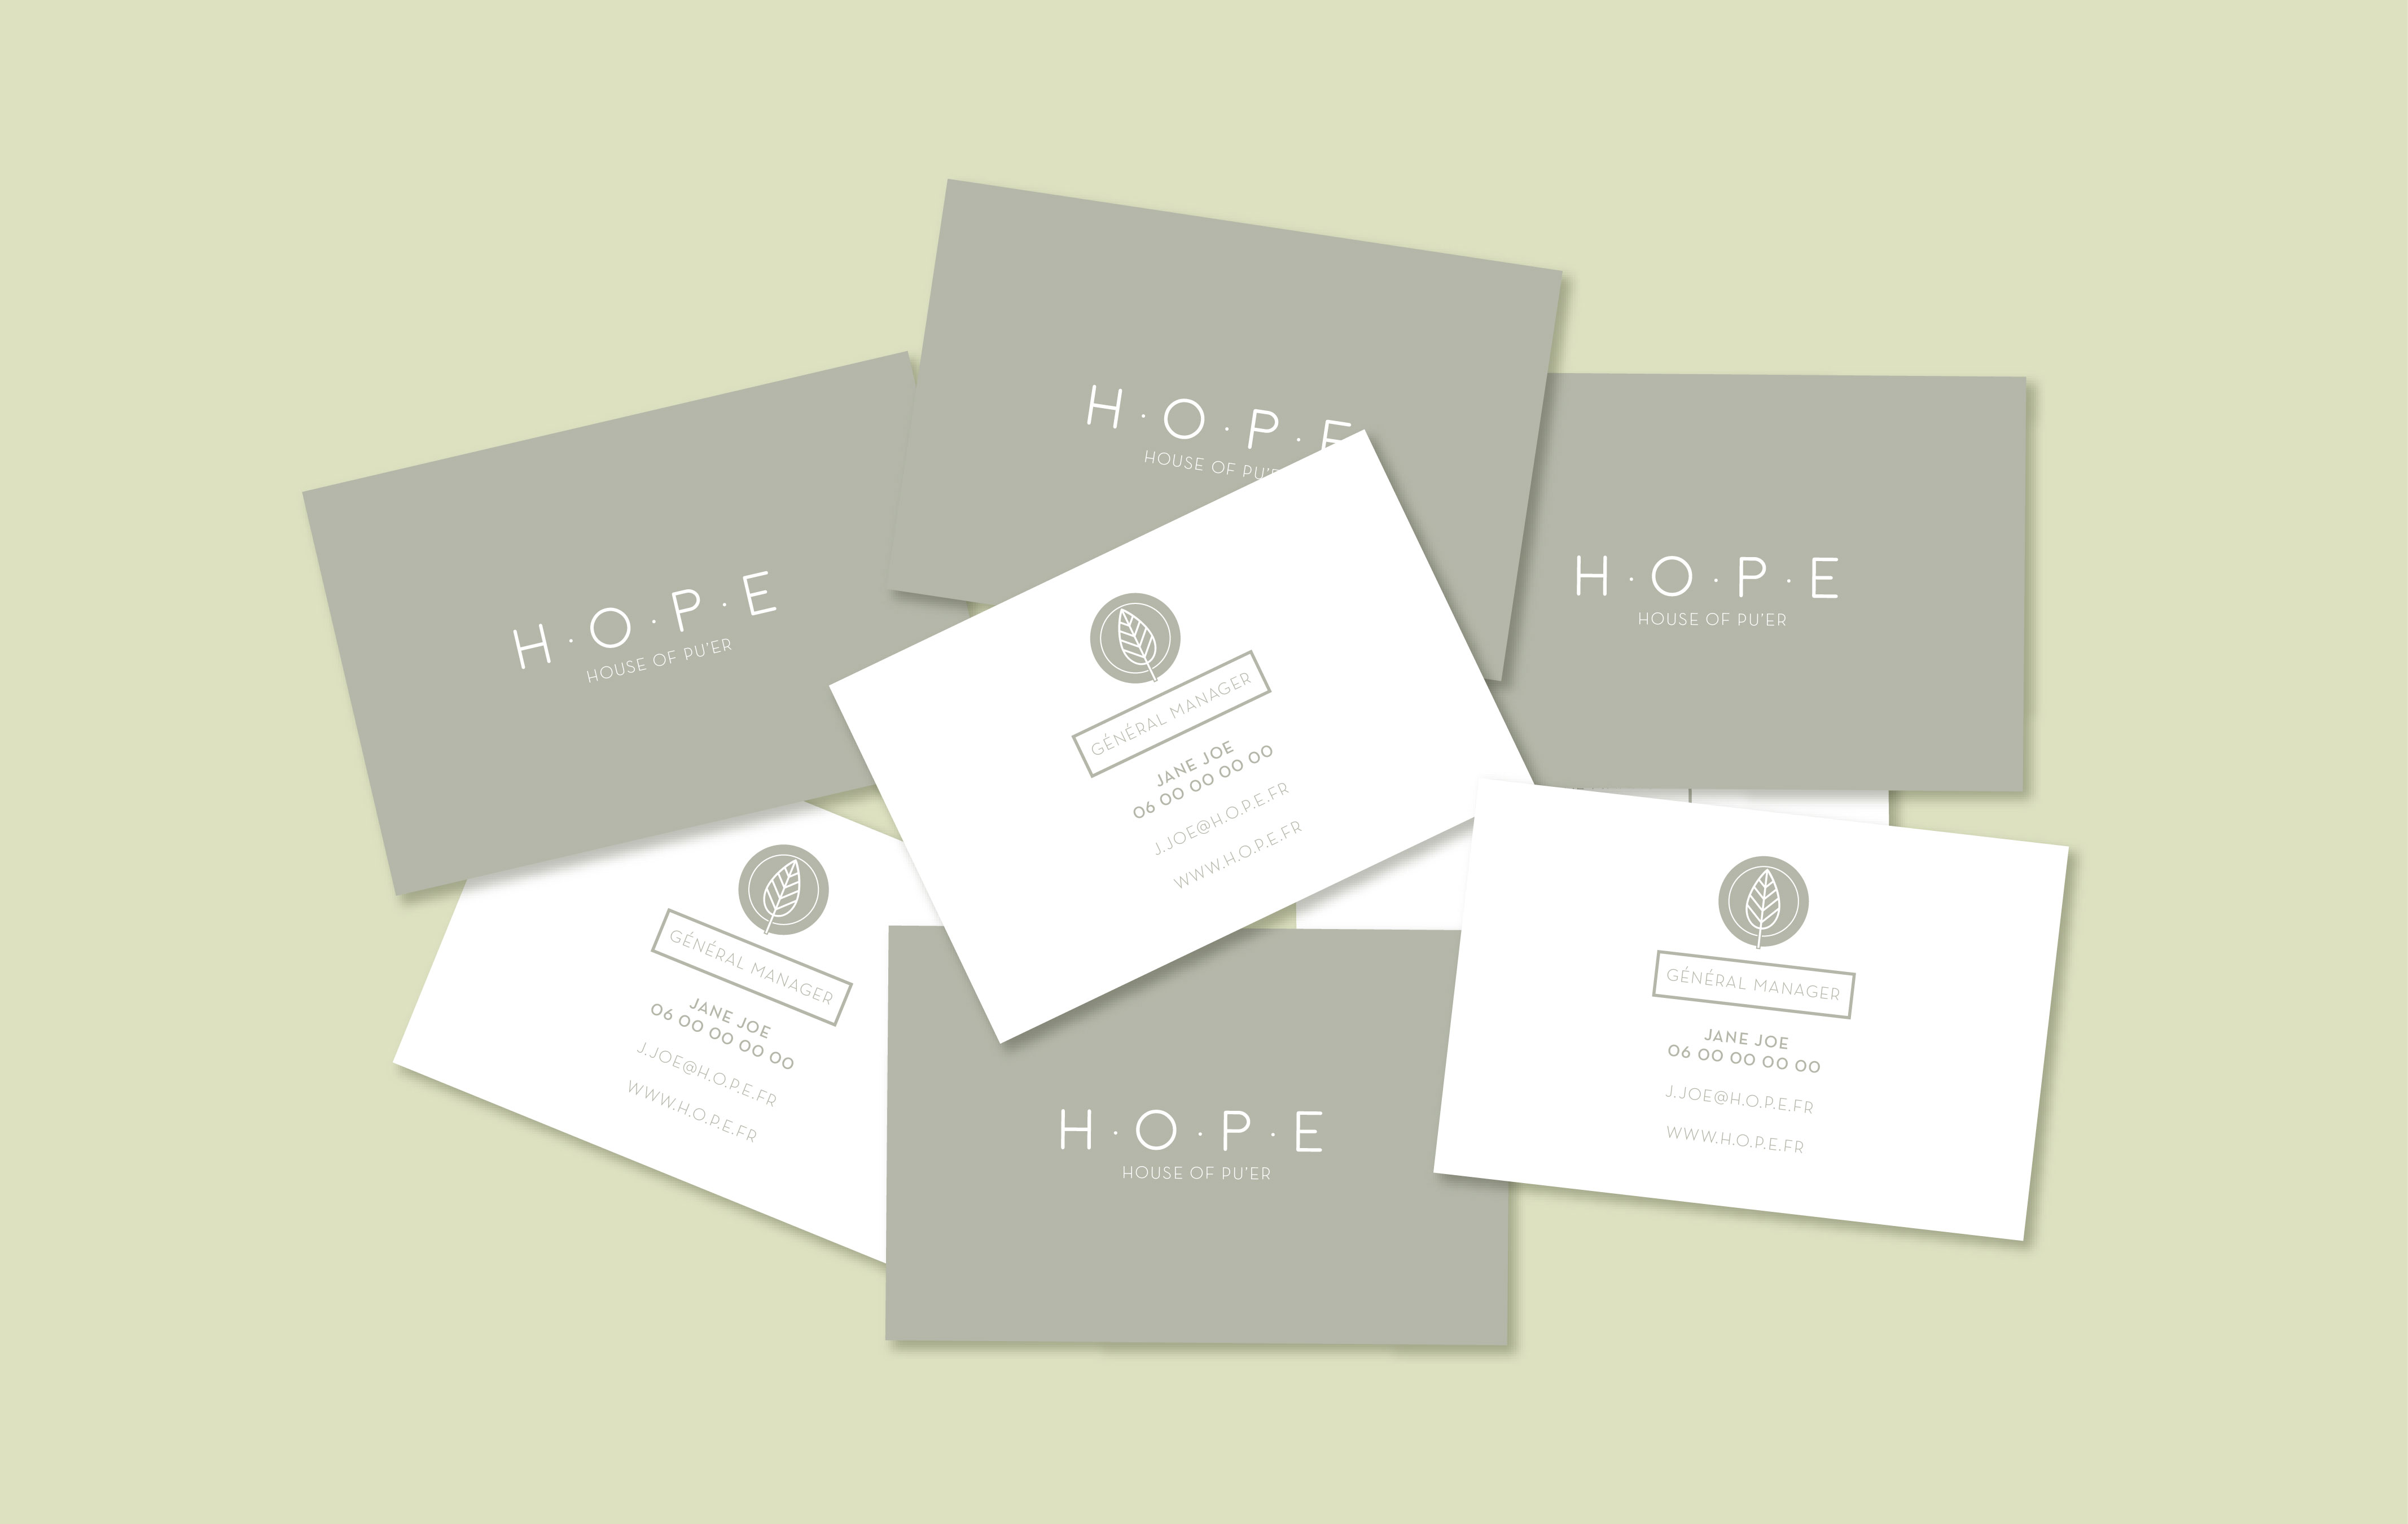 mariebabeau-graphiste-photographe-independante-freelance-strasbourg-creation de logo-identite-marque de the-HOPE